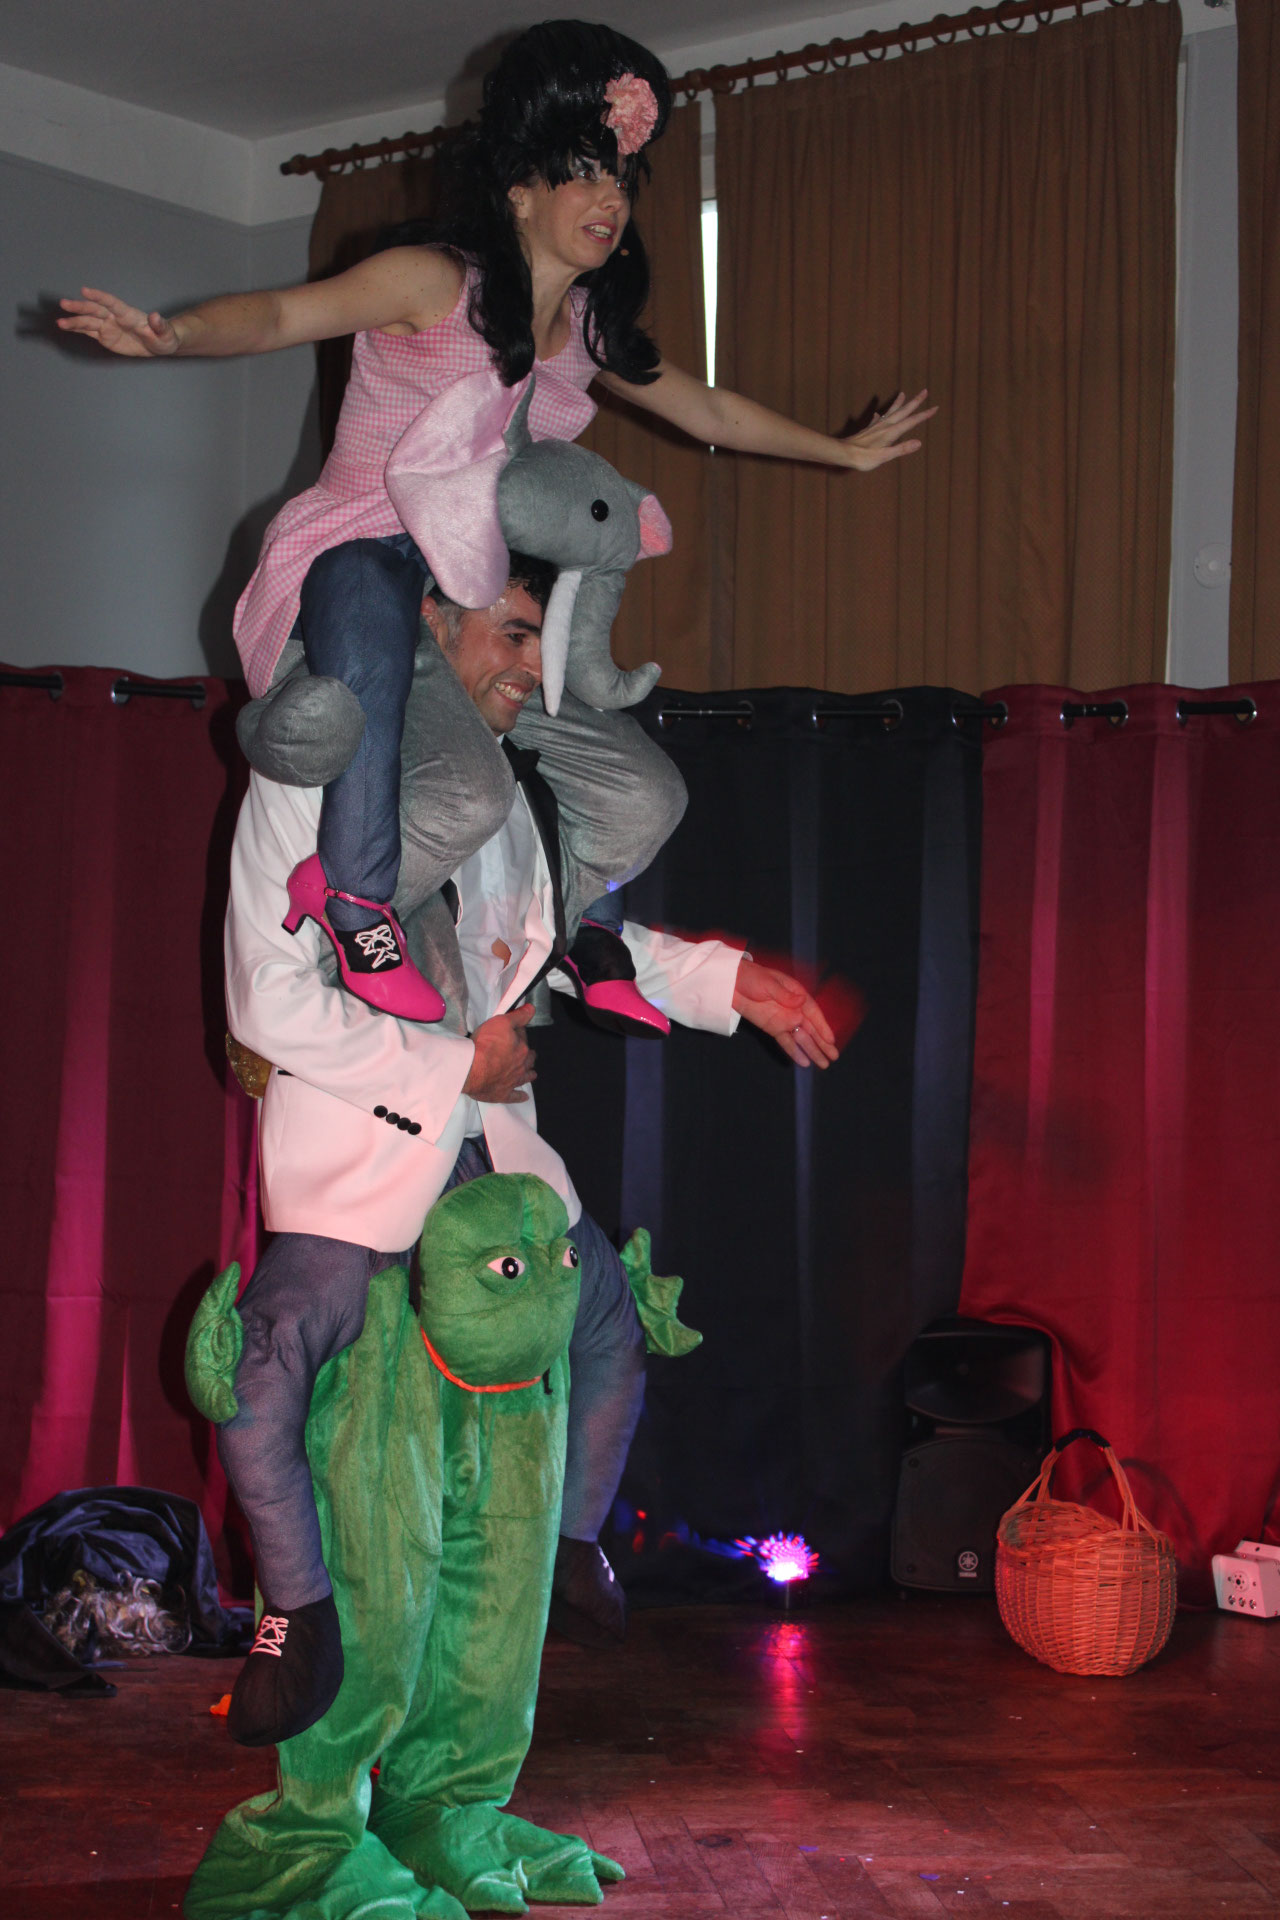 Fin du spectacle avec Shirley et Dino